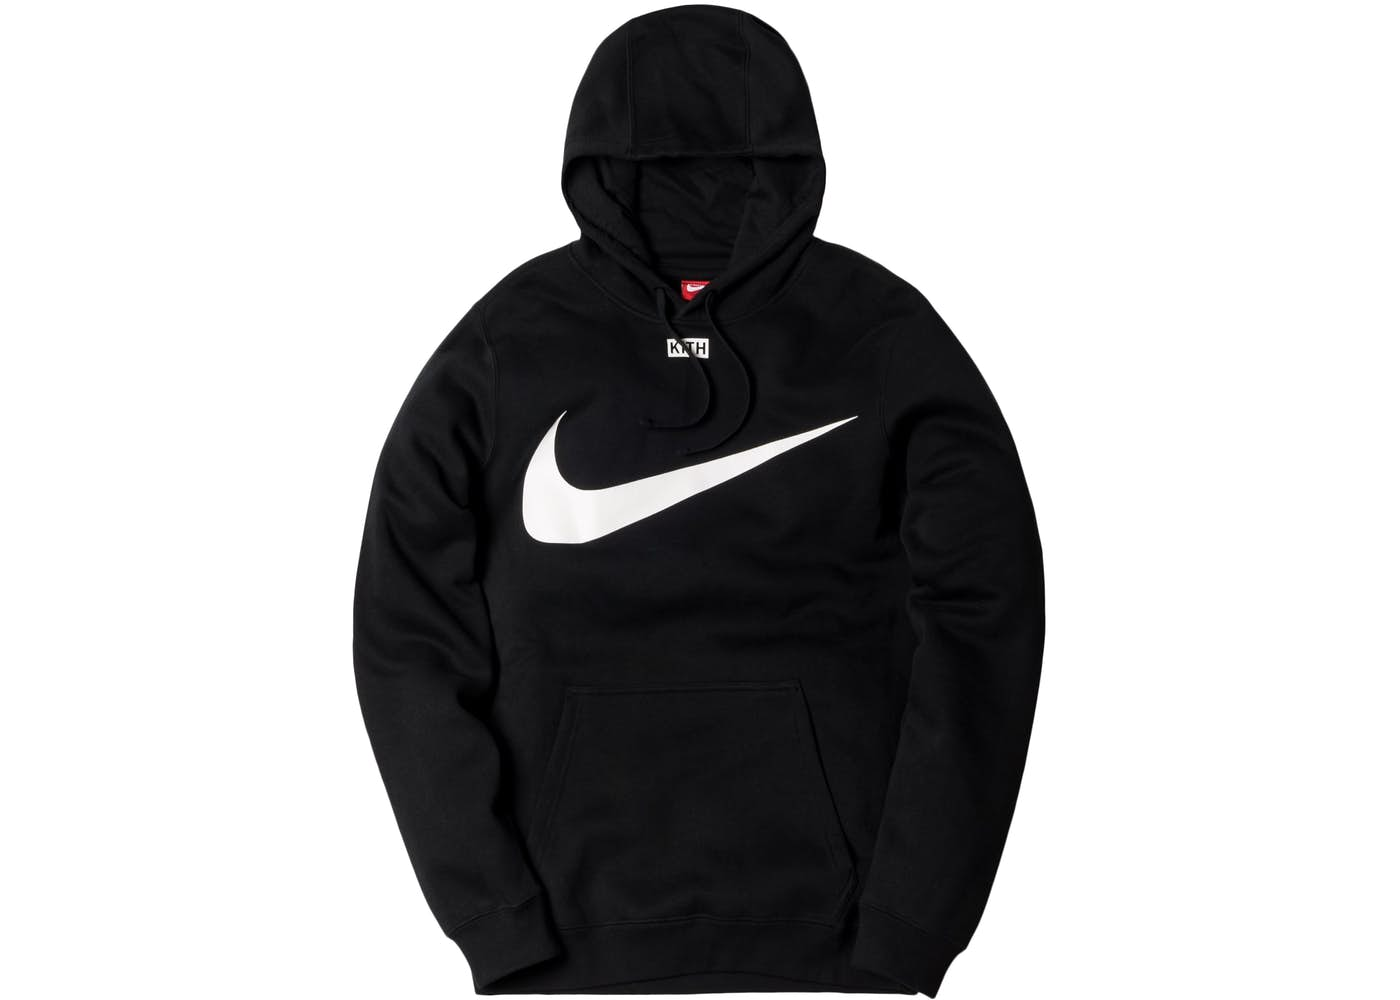 Kith Nike Swoosh Hoodie Black